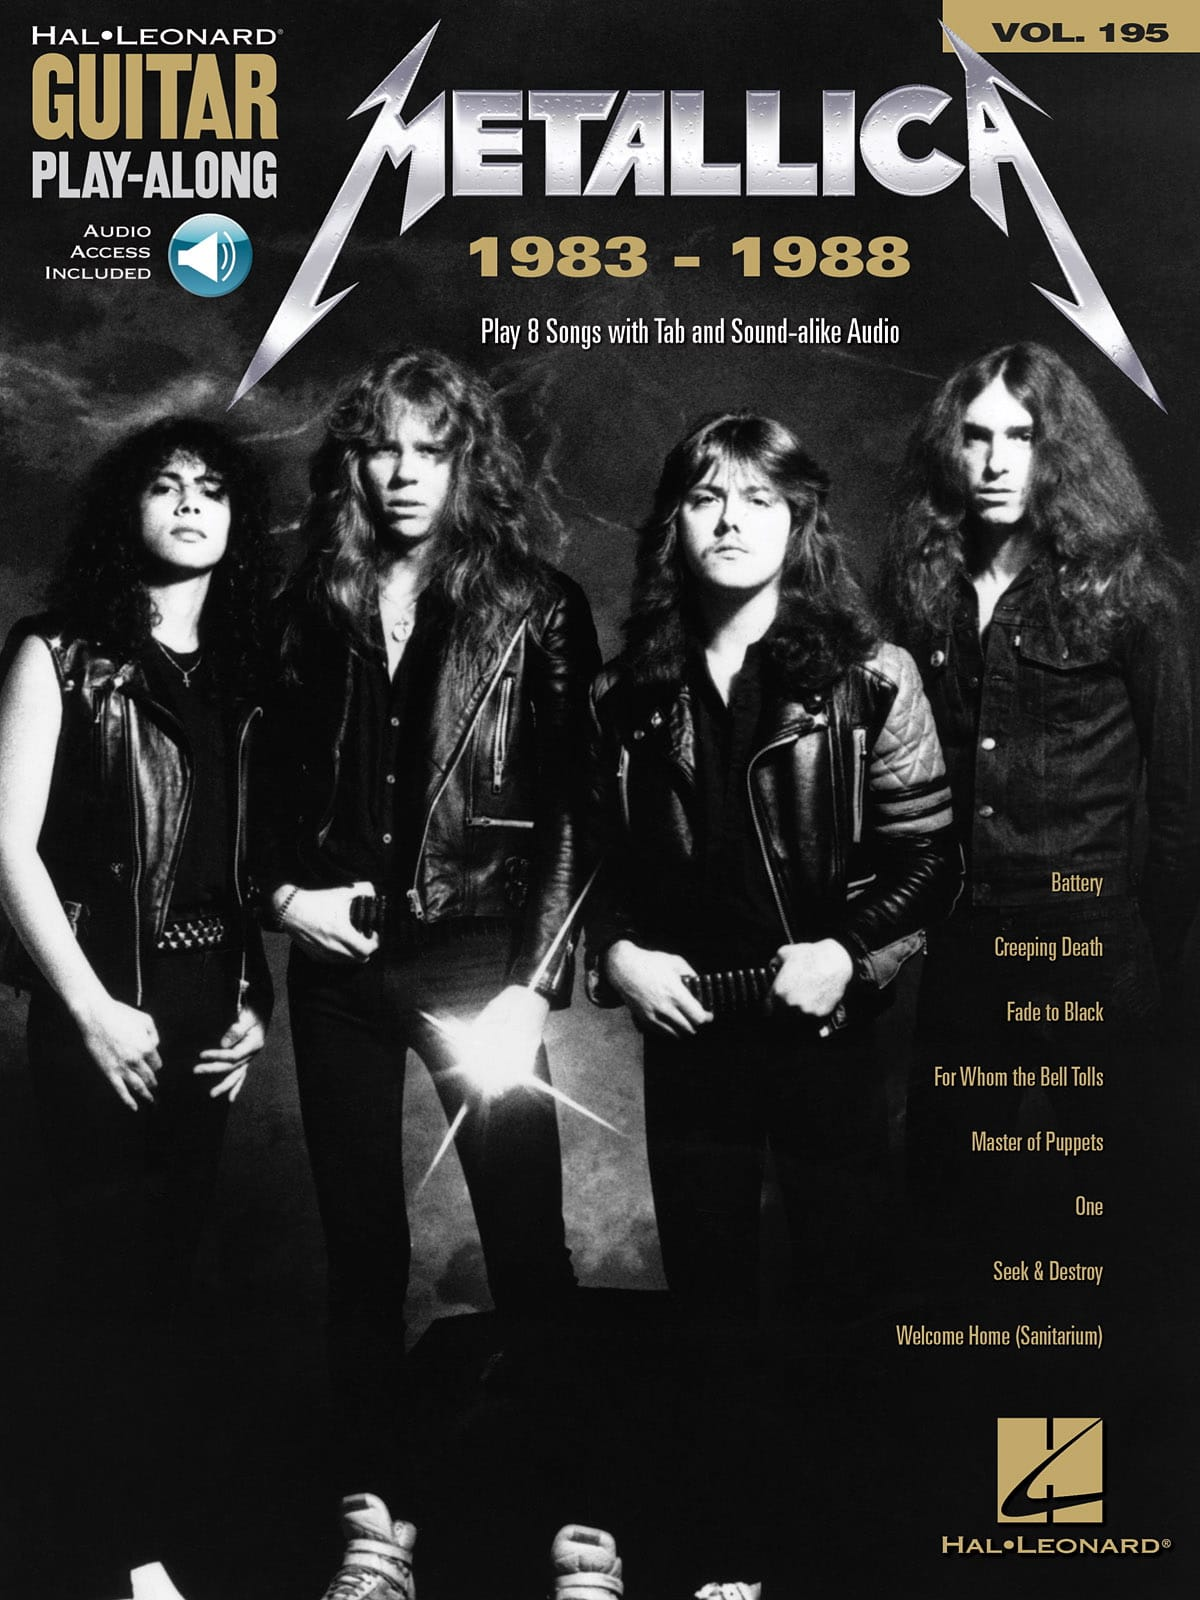 Metallica - Guitar Play-Along Volume 195 - Metallica: 1983-1988 - Partition - di-arezzo.co.uk